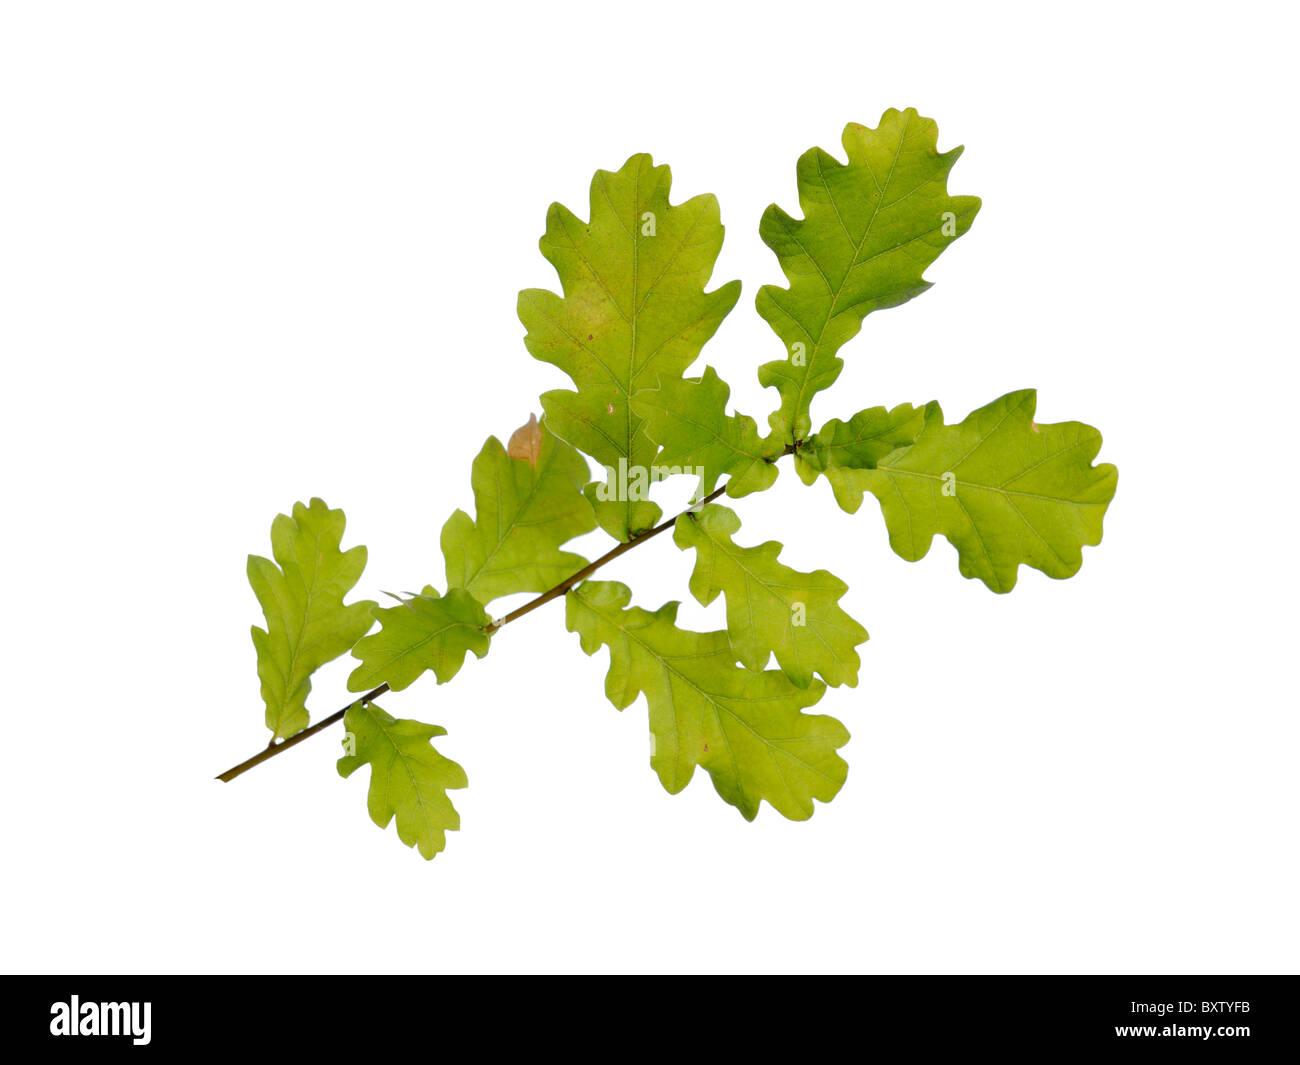 English oak leaves - Stock Image